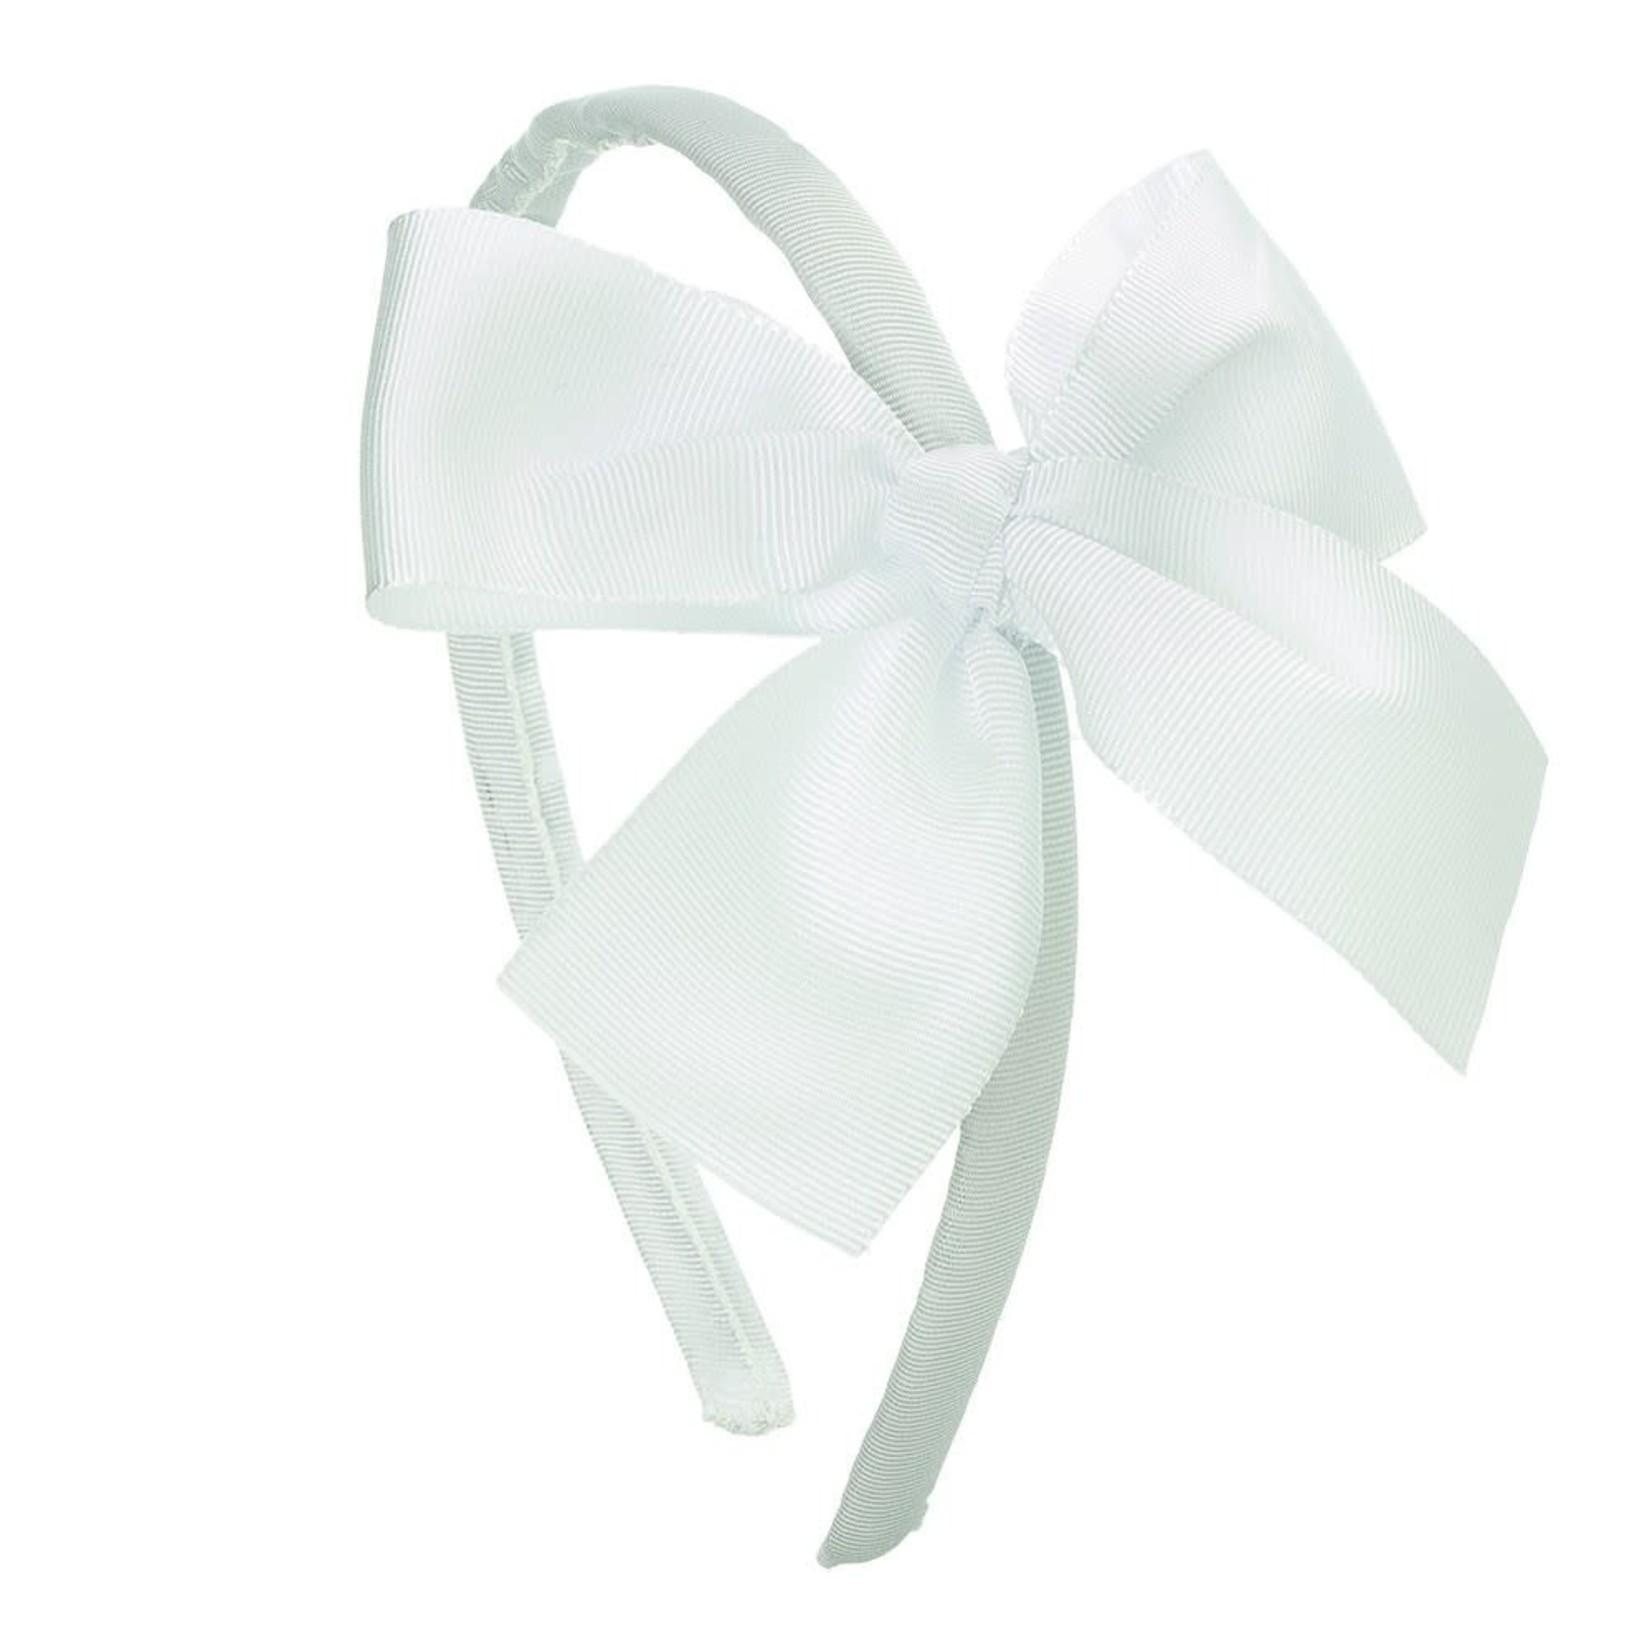 Siena Diadeem Large Bow - White